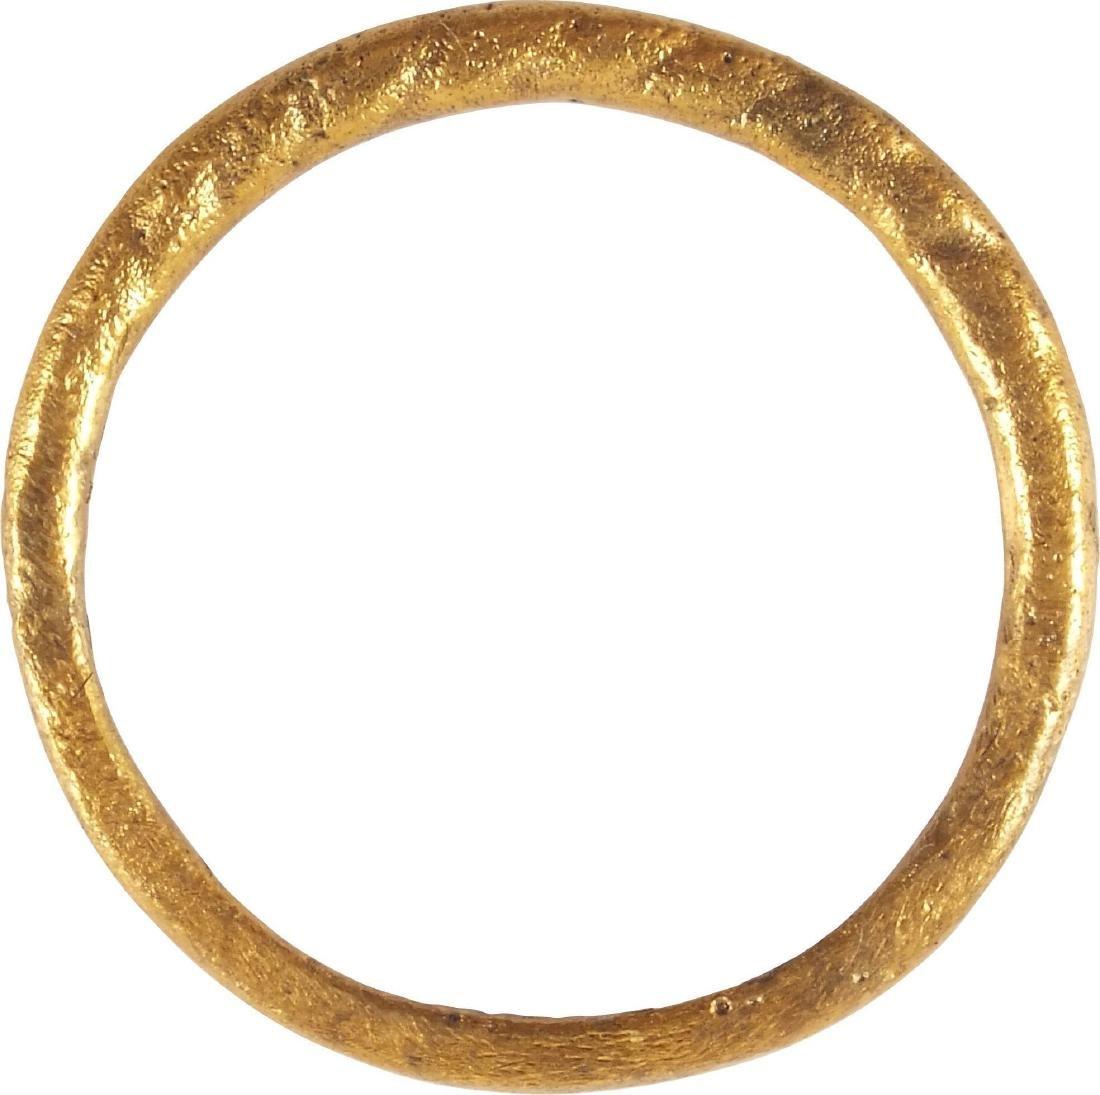 VIKING TWISTED MOTIF RING 850-1050 AD - 2